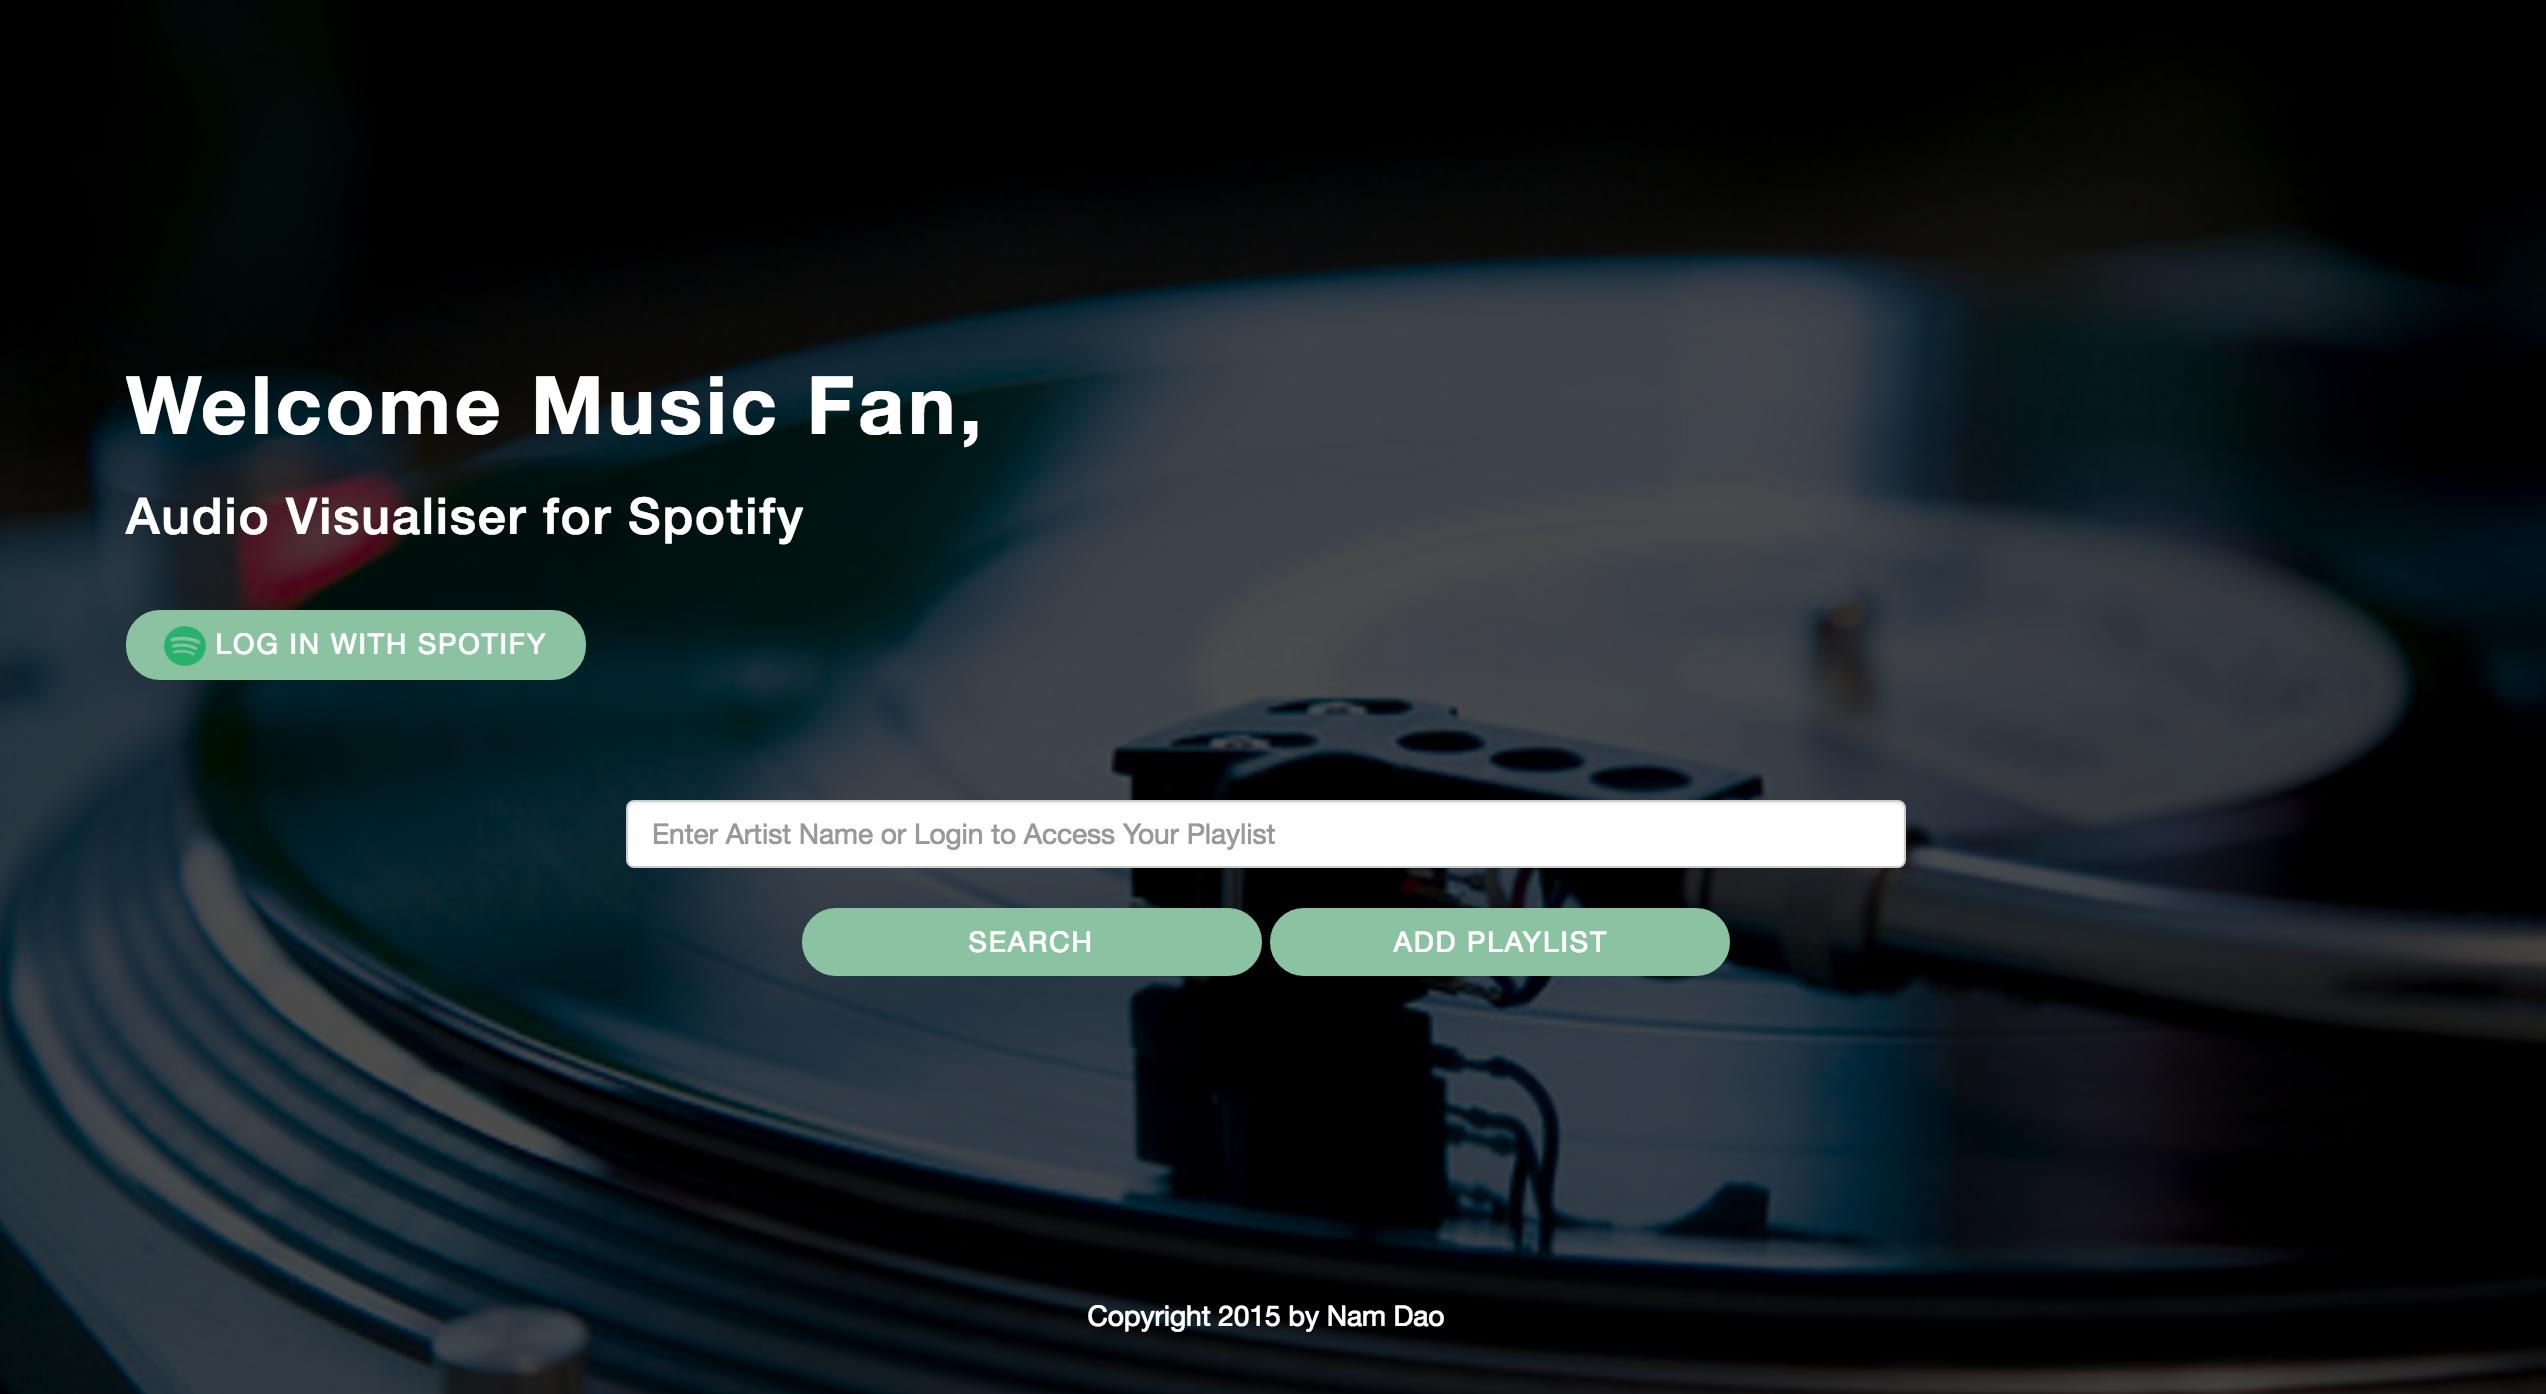 GitHub - nismodao/Spotify-Music-Player-with-Audio-Visualization